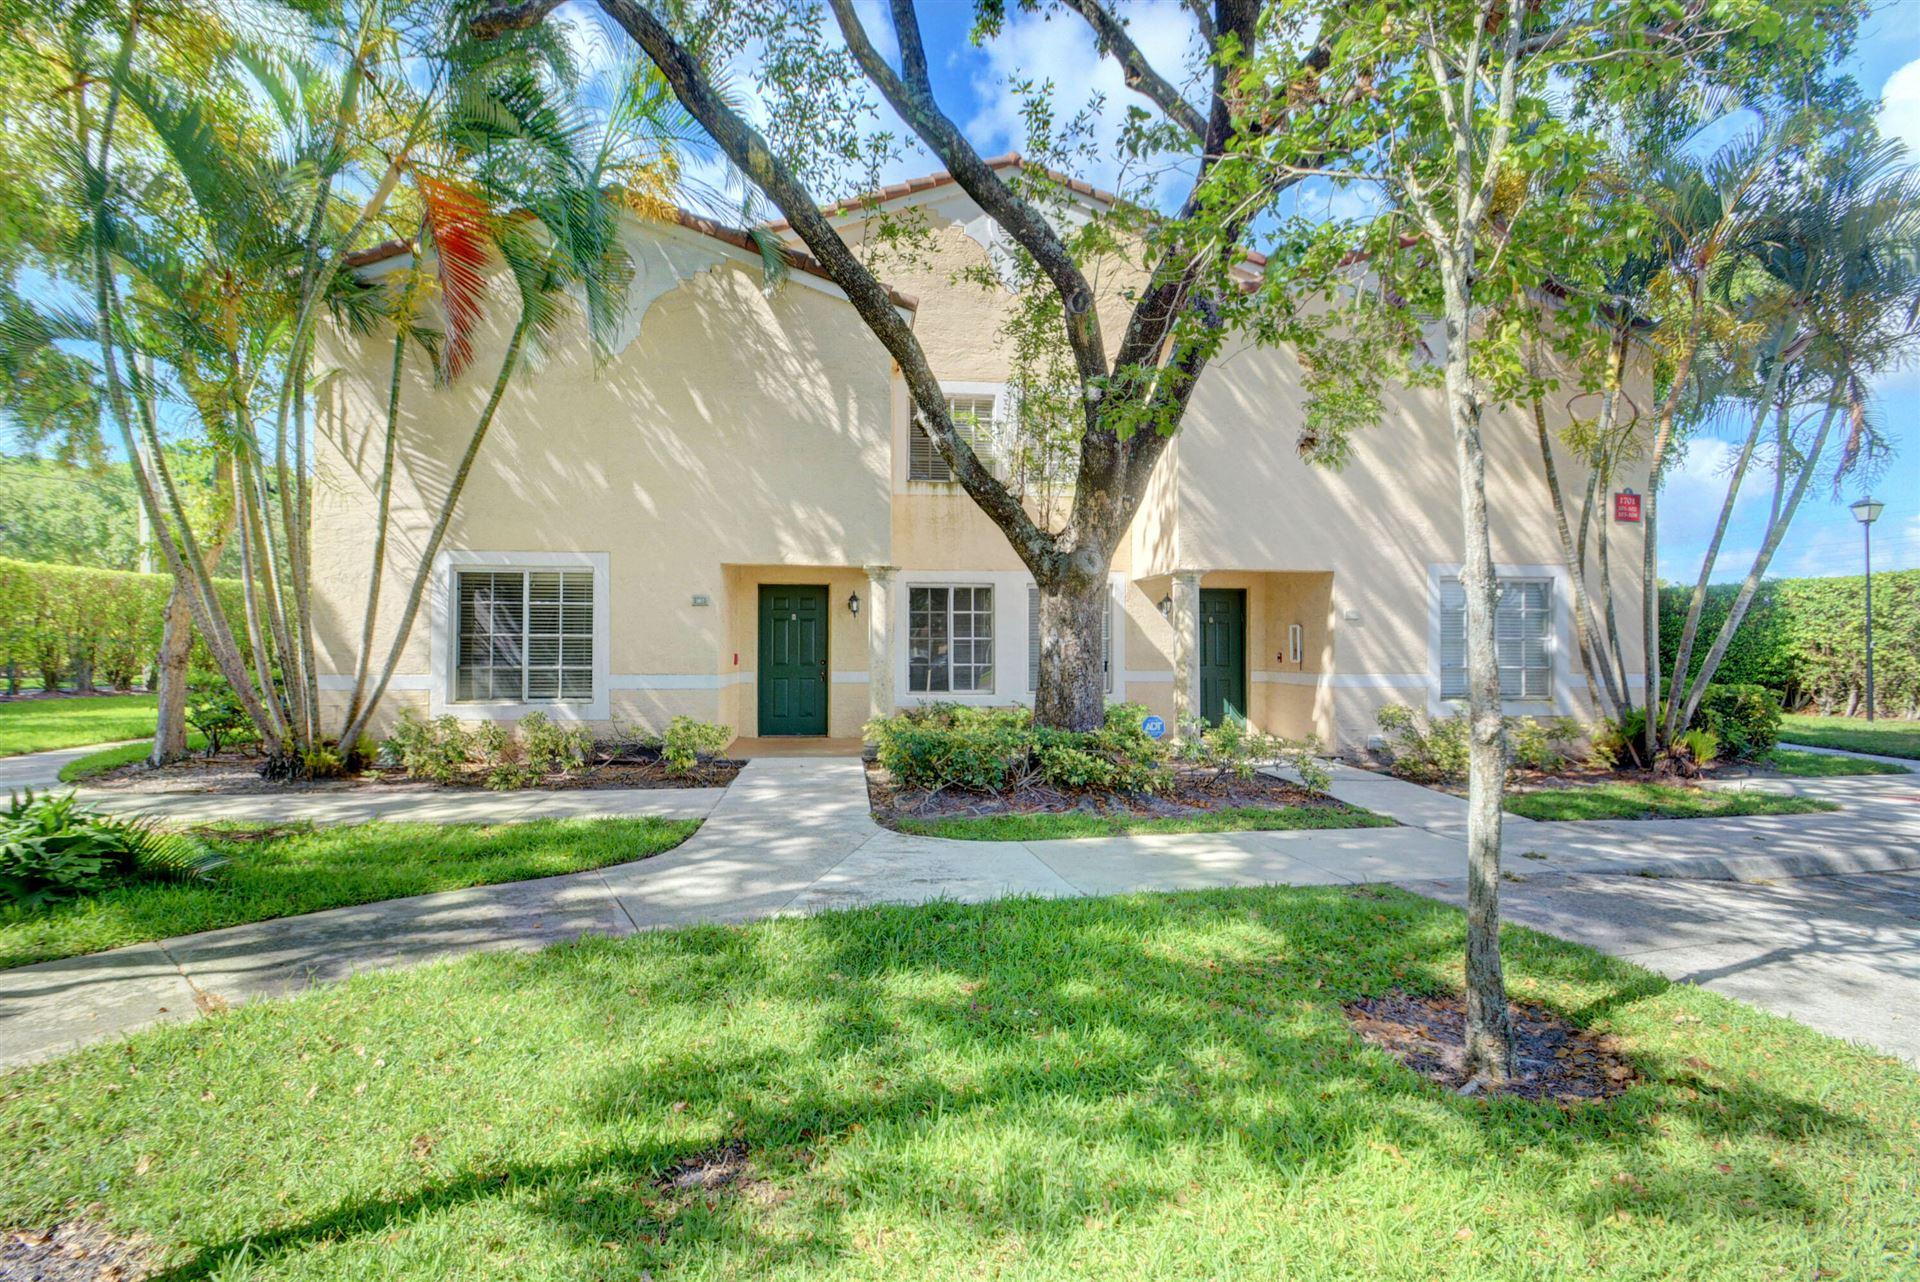 1701 Village Boulevard #102, West Palm Beach, FL 33409 - MLS#: RX-10723008